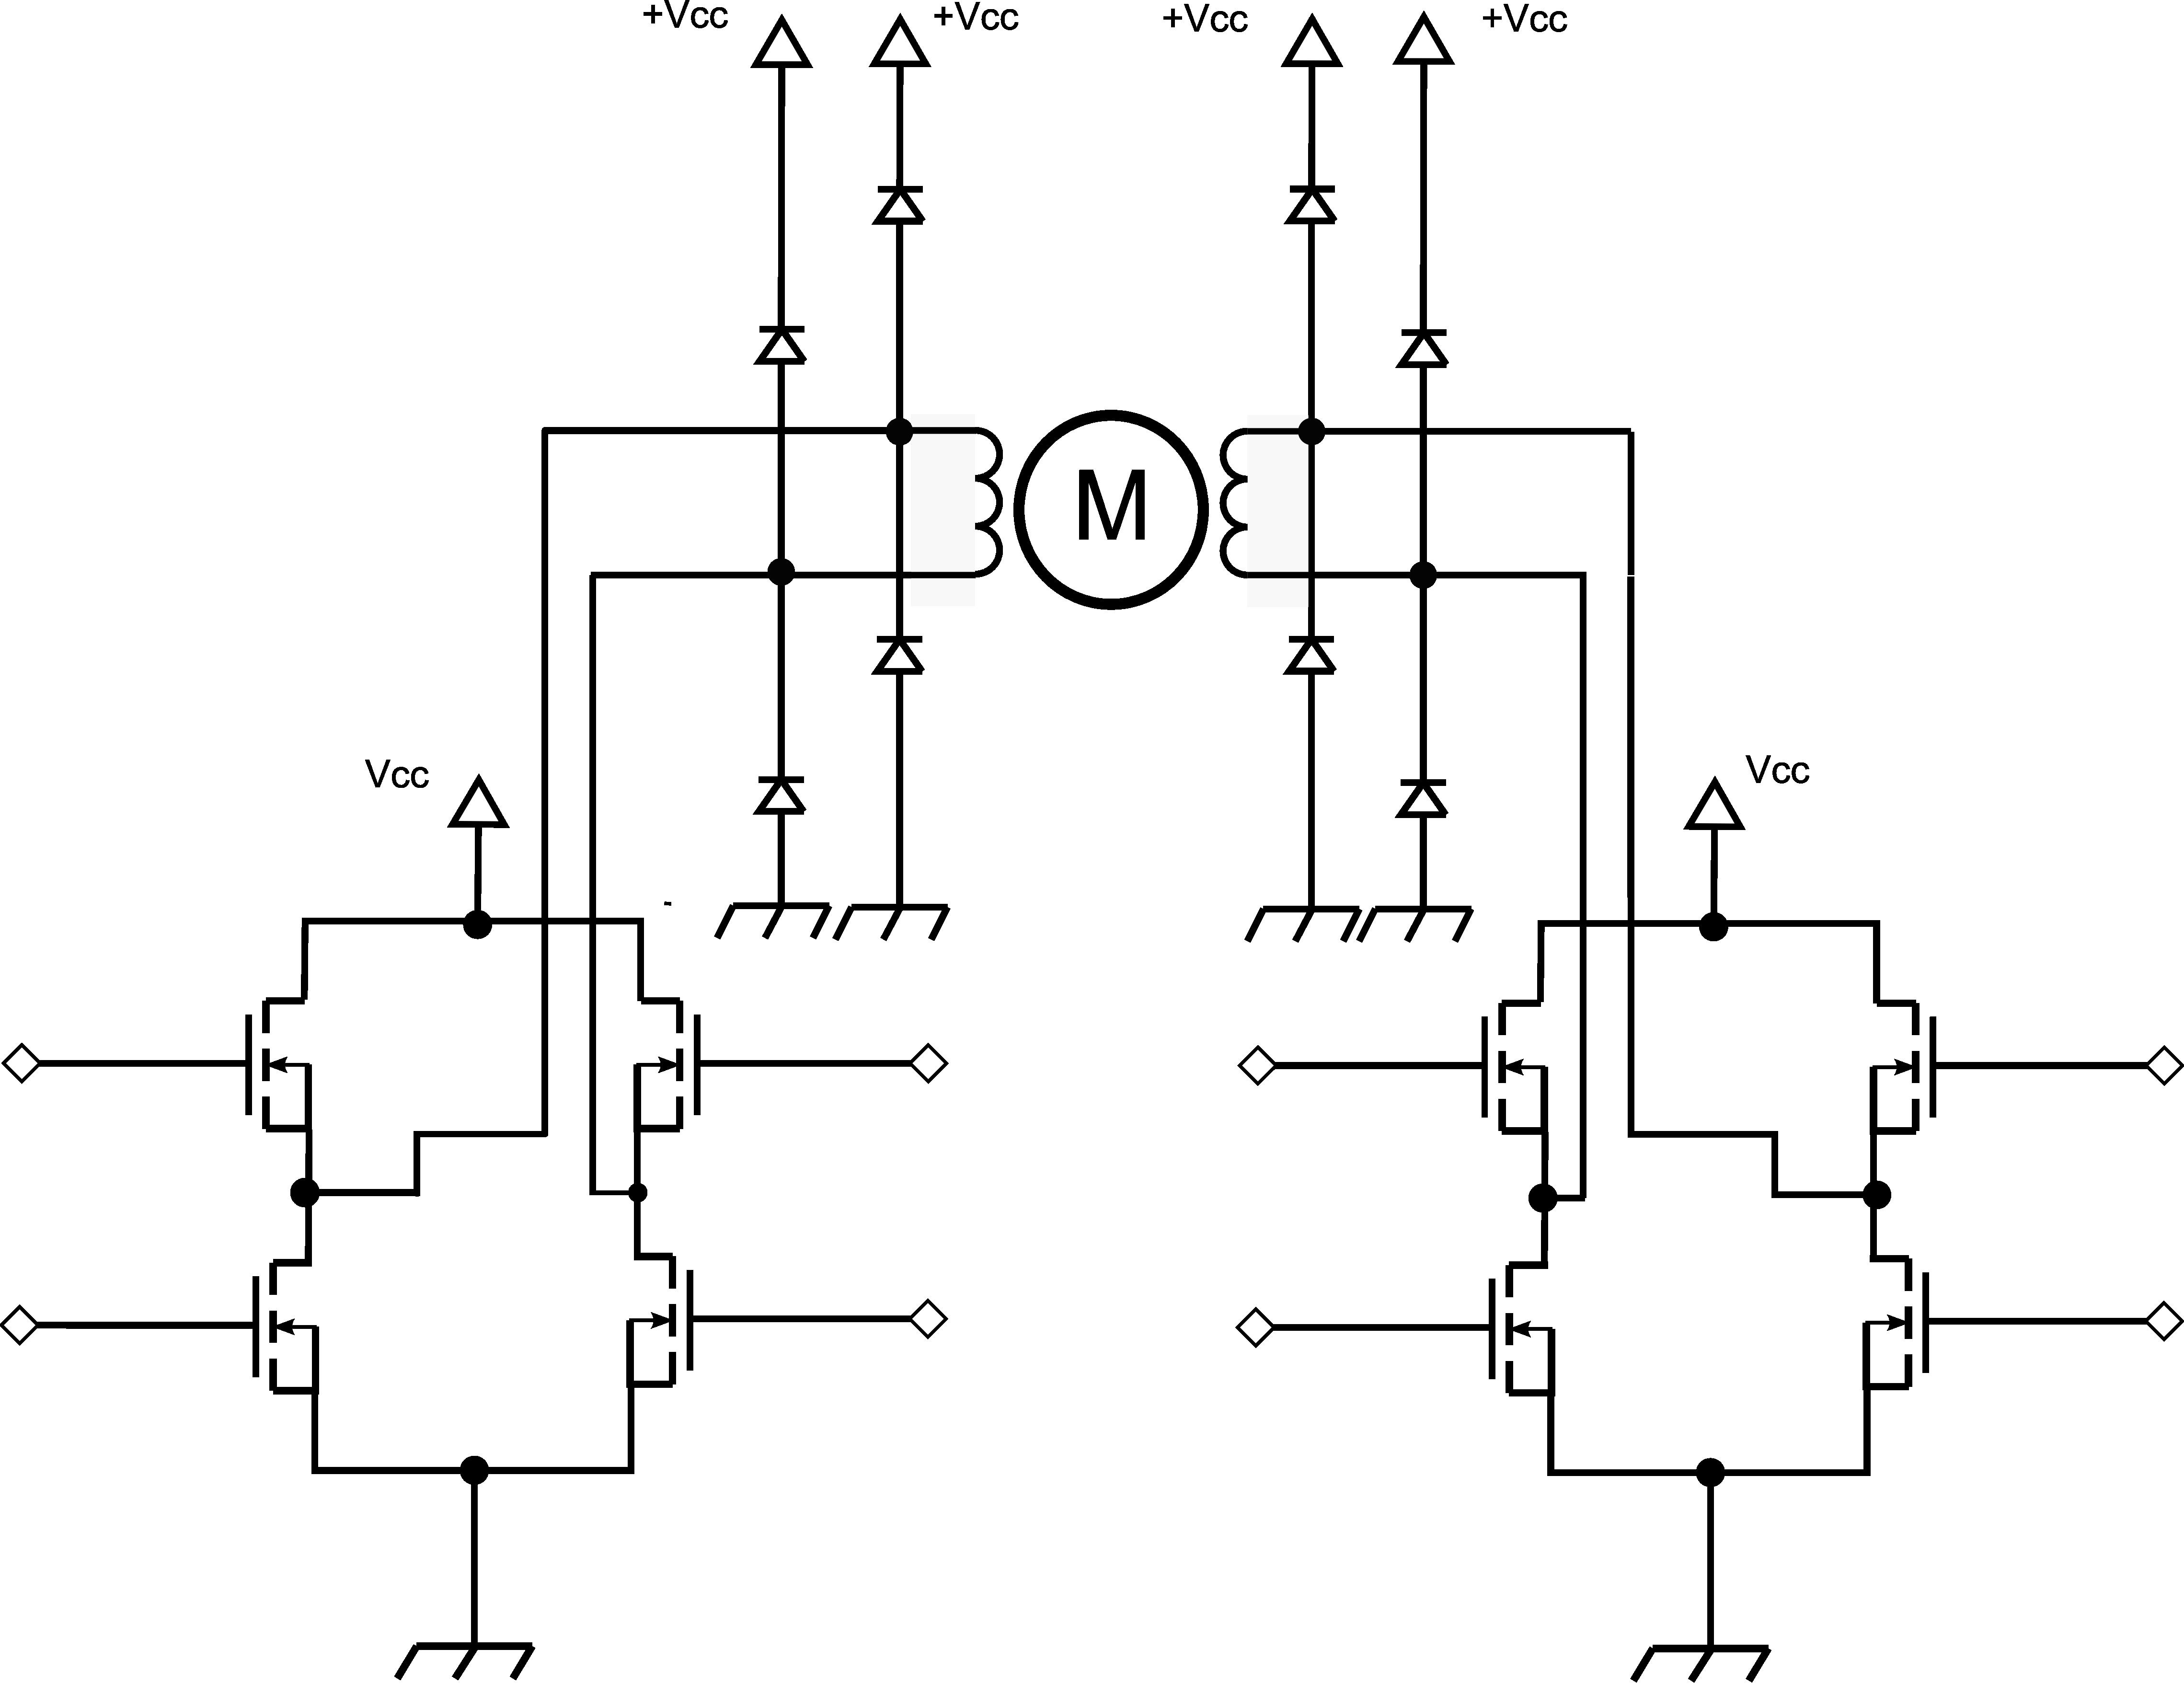 Schema Elettrico Per Motore Passo Passo : Laurtec pj pilotare i motori passo in